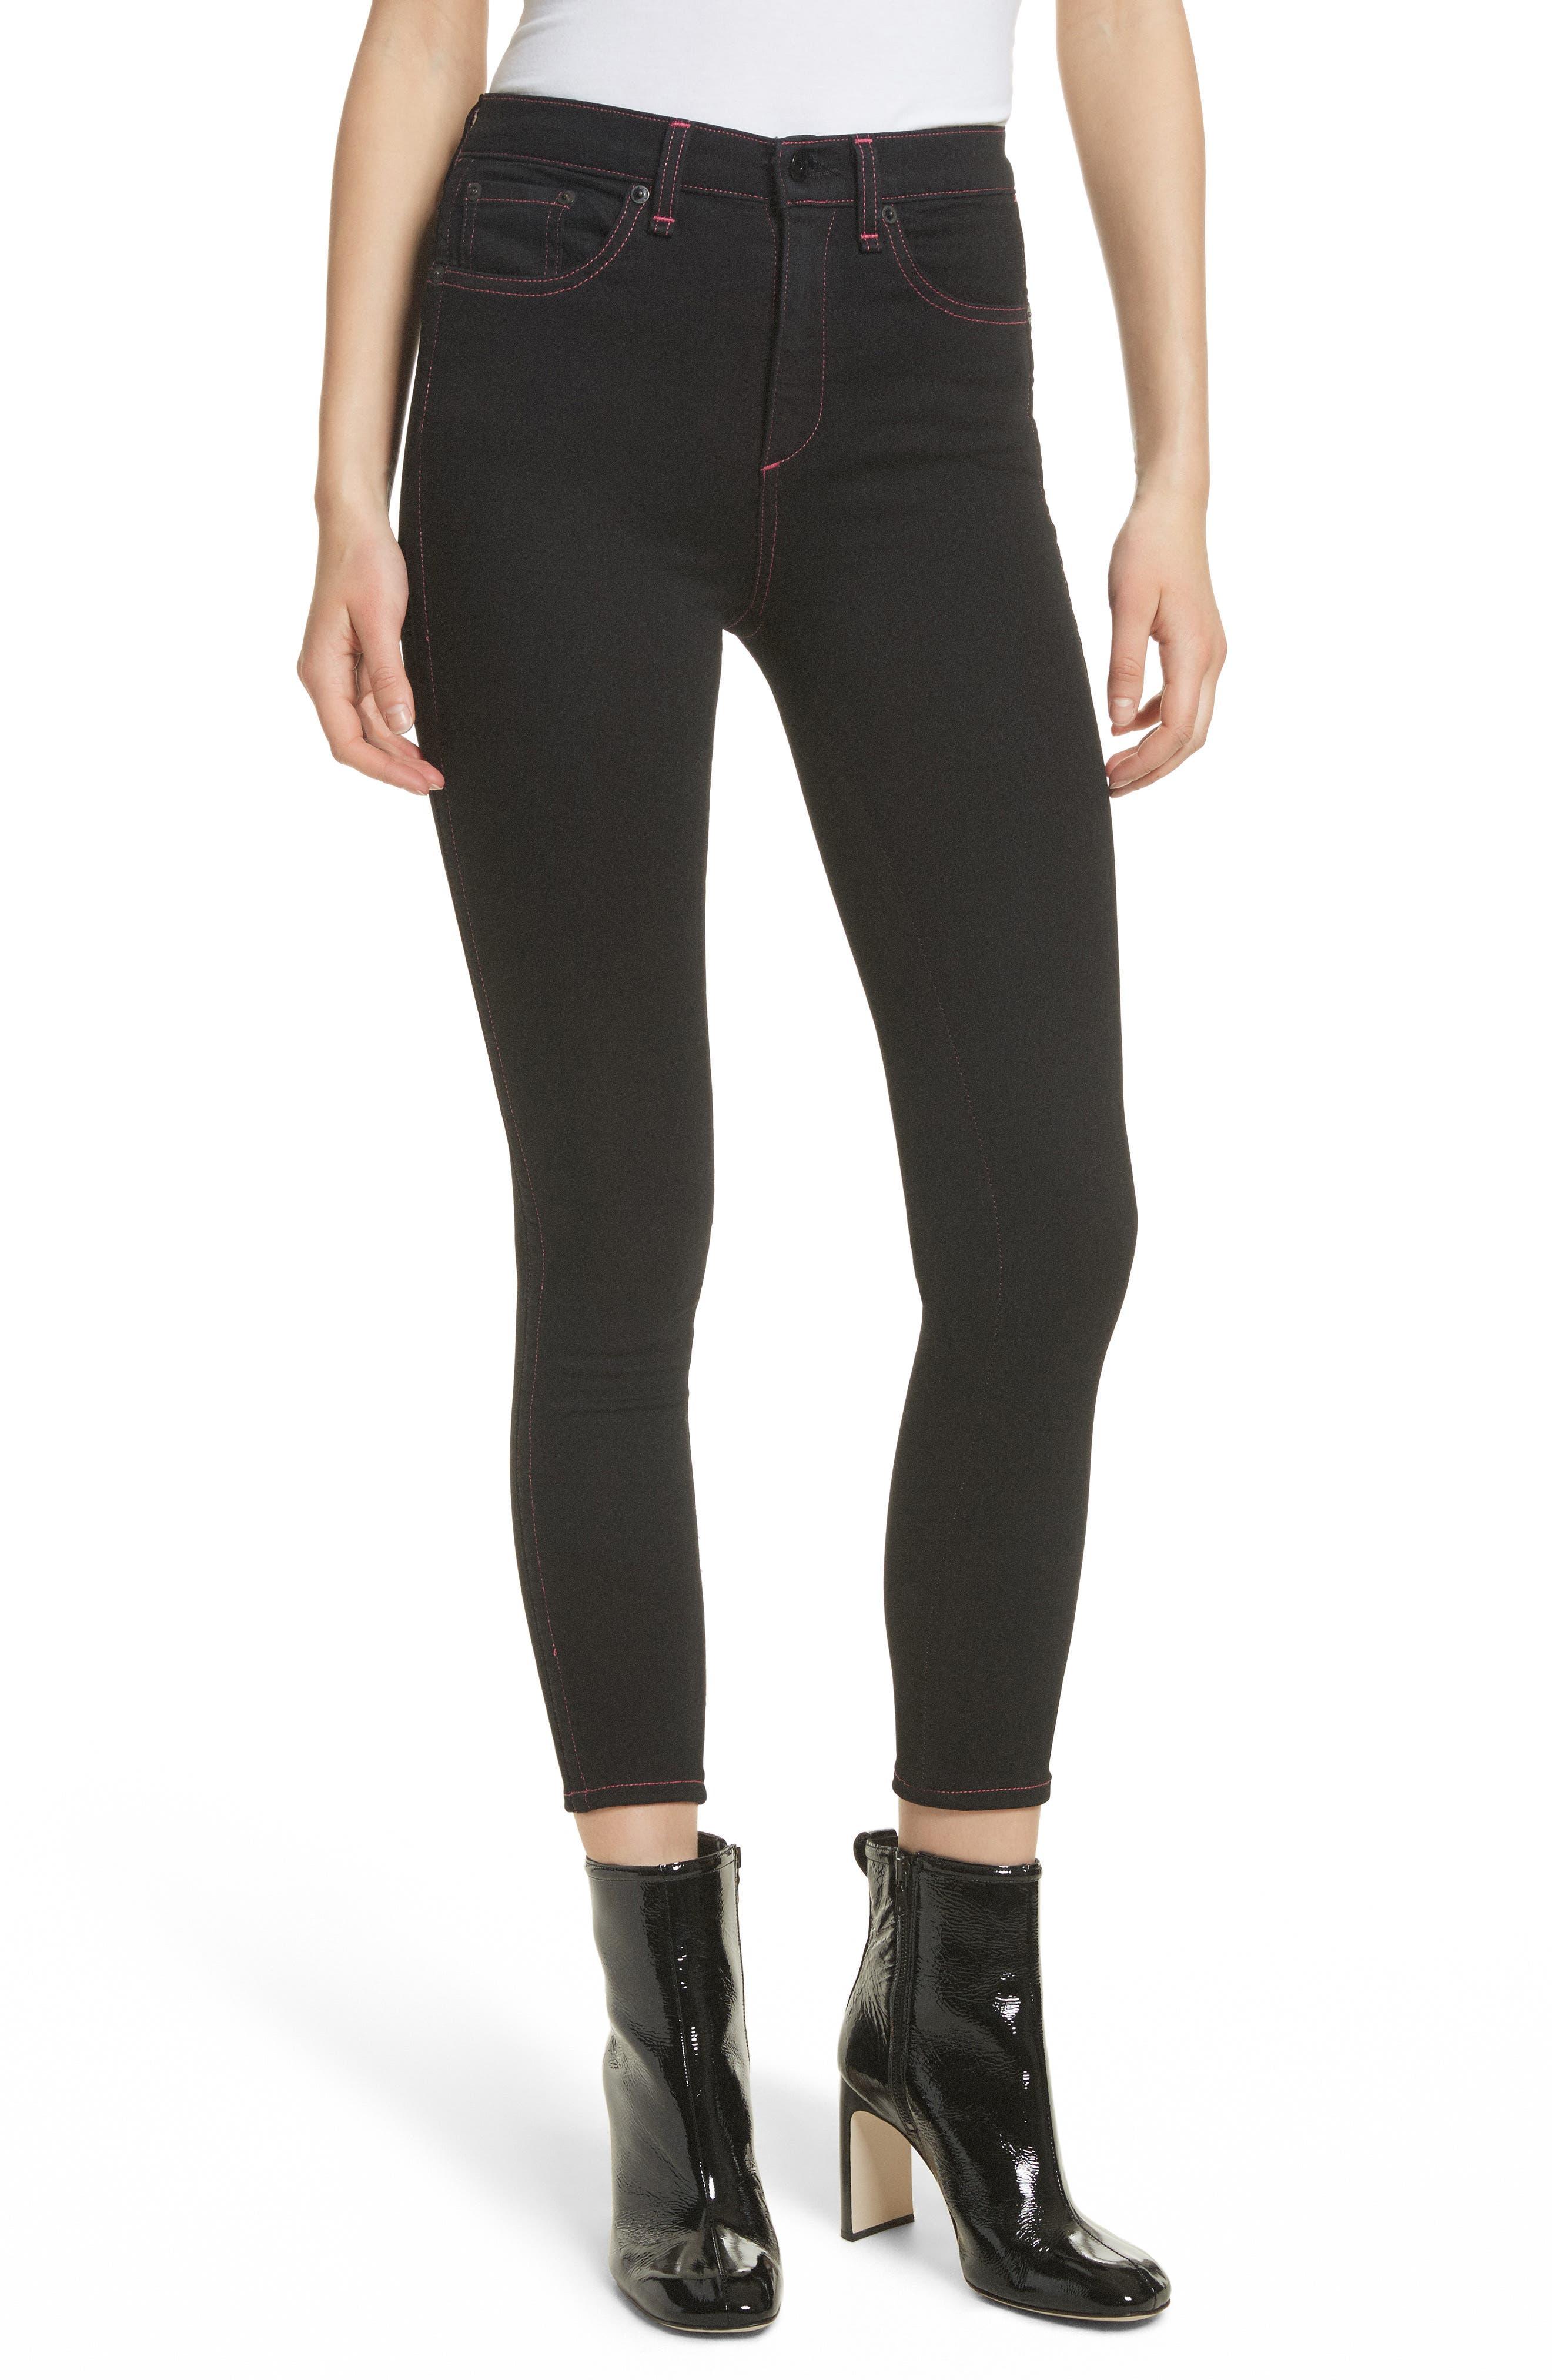 Miich High Rise Crop Skinny Jeans,                         Main,                         color, Black Stitch